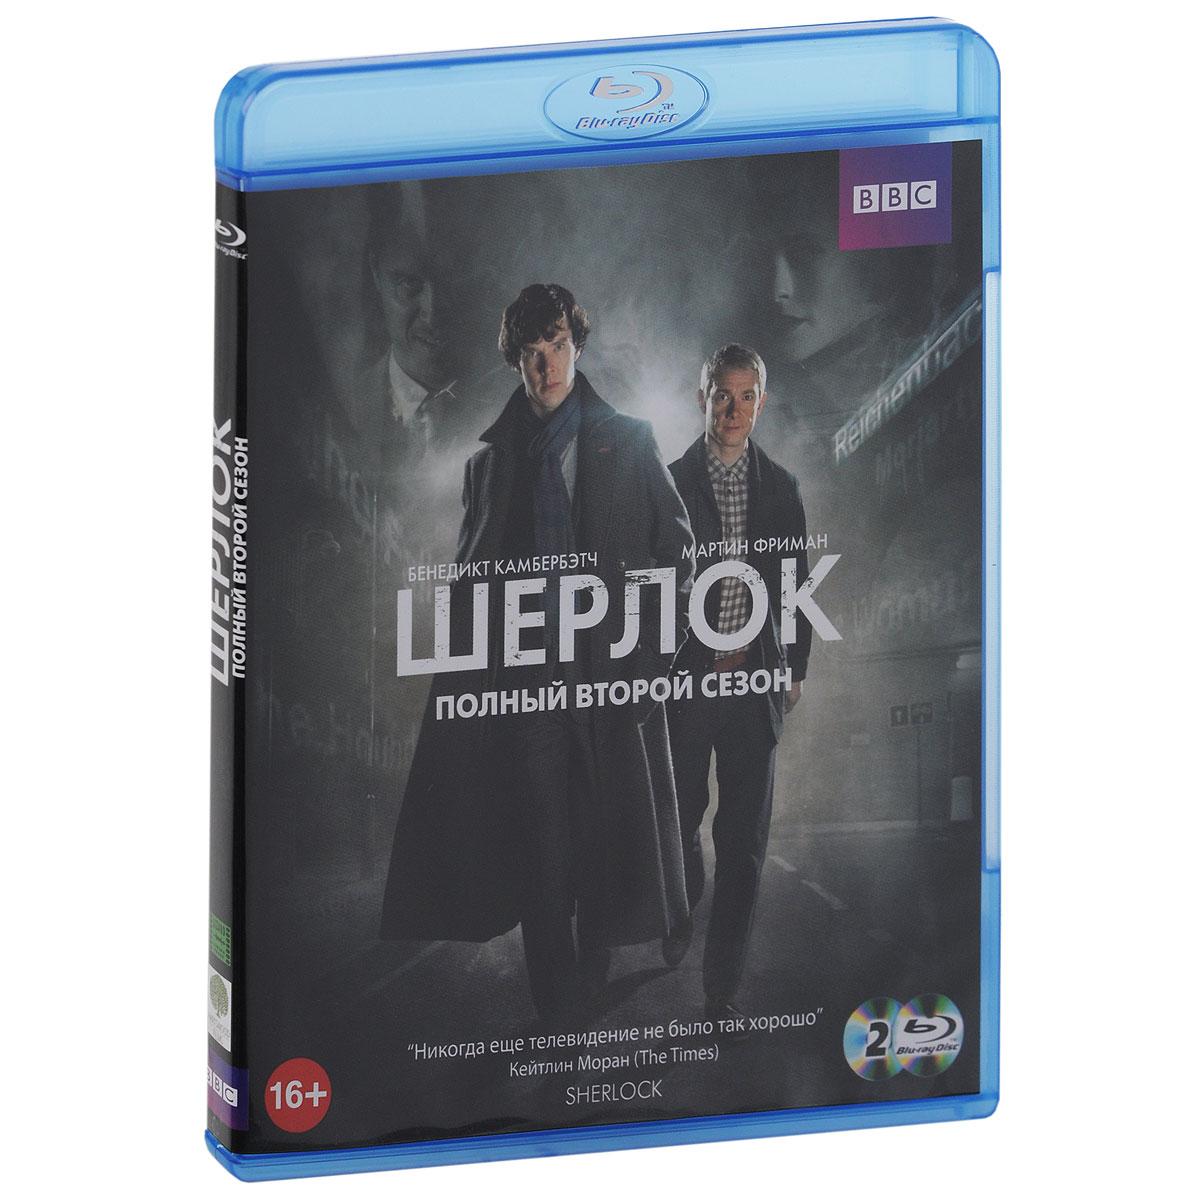 Шерлок: Сезон 2, серии 1-3 (2 Blu-Ray)